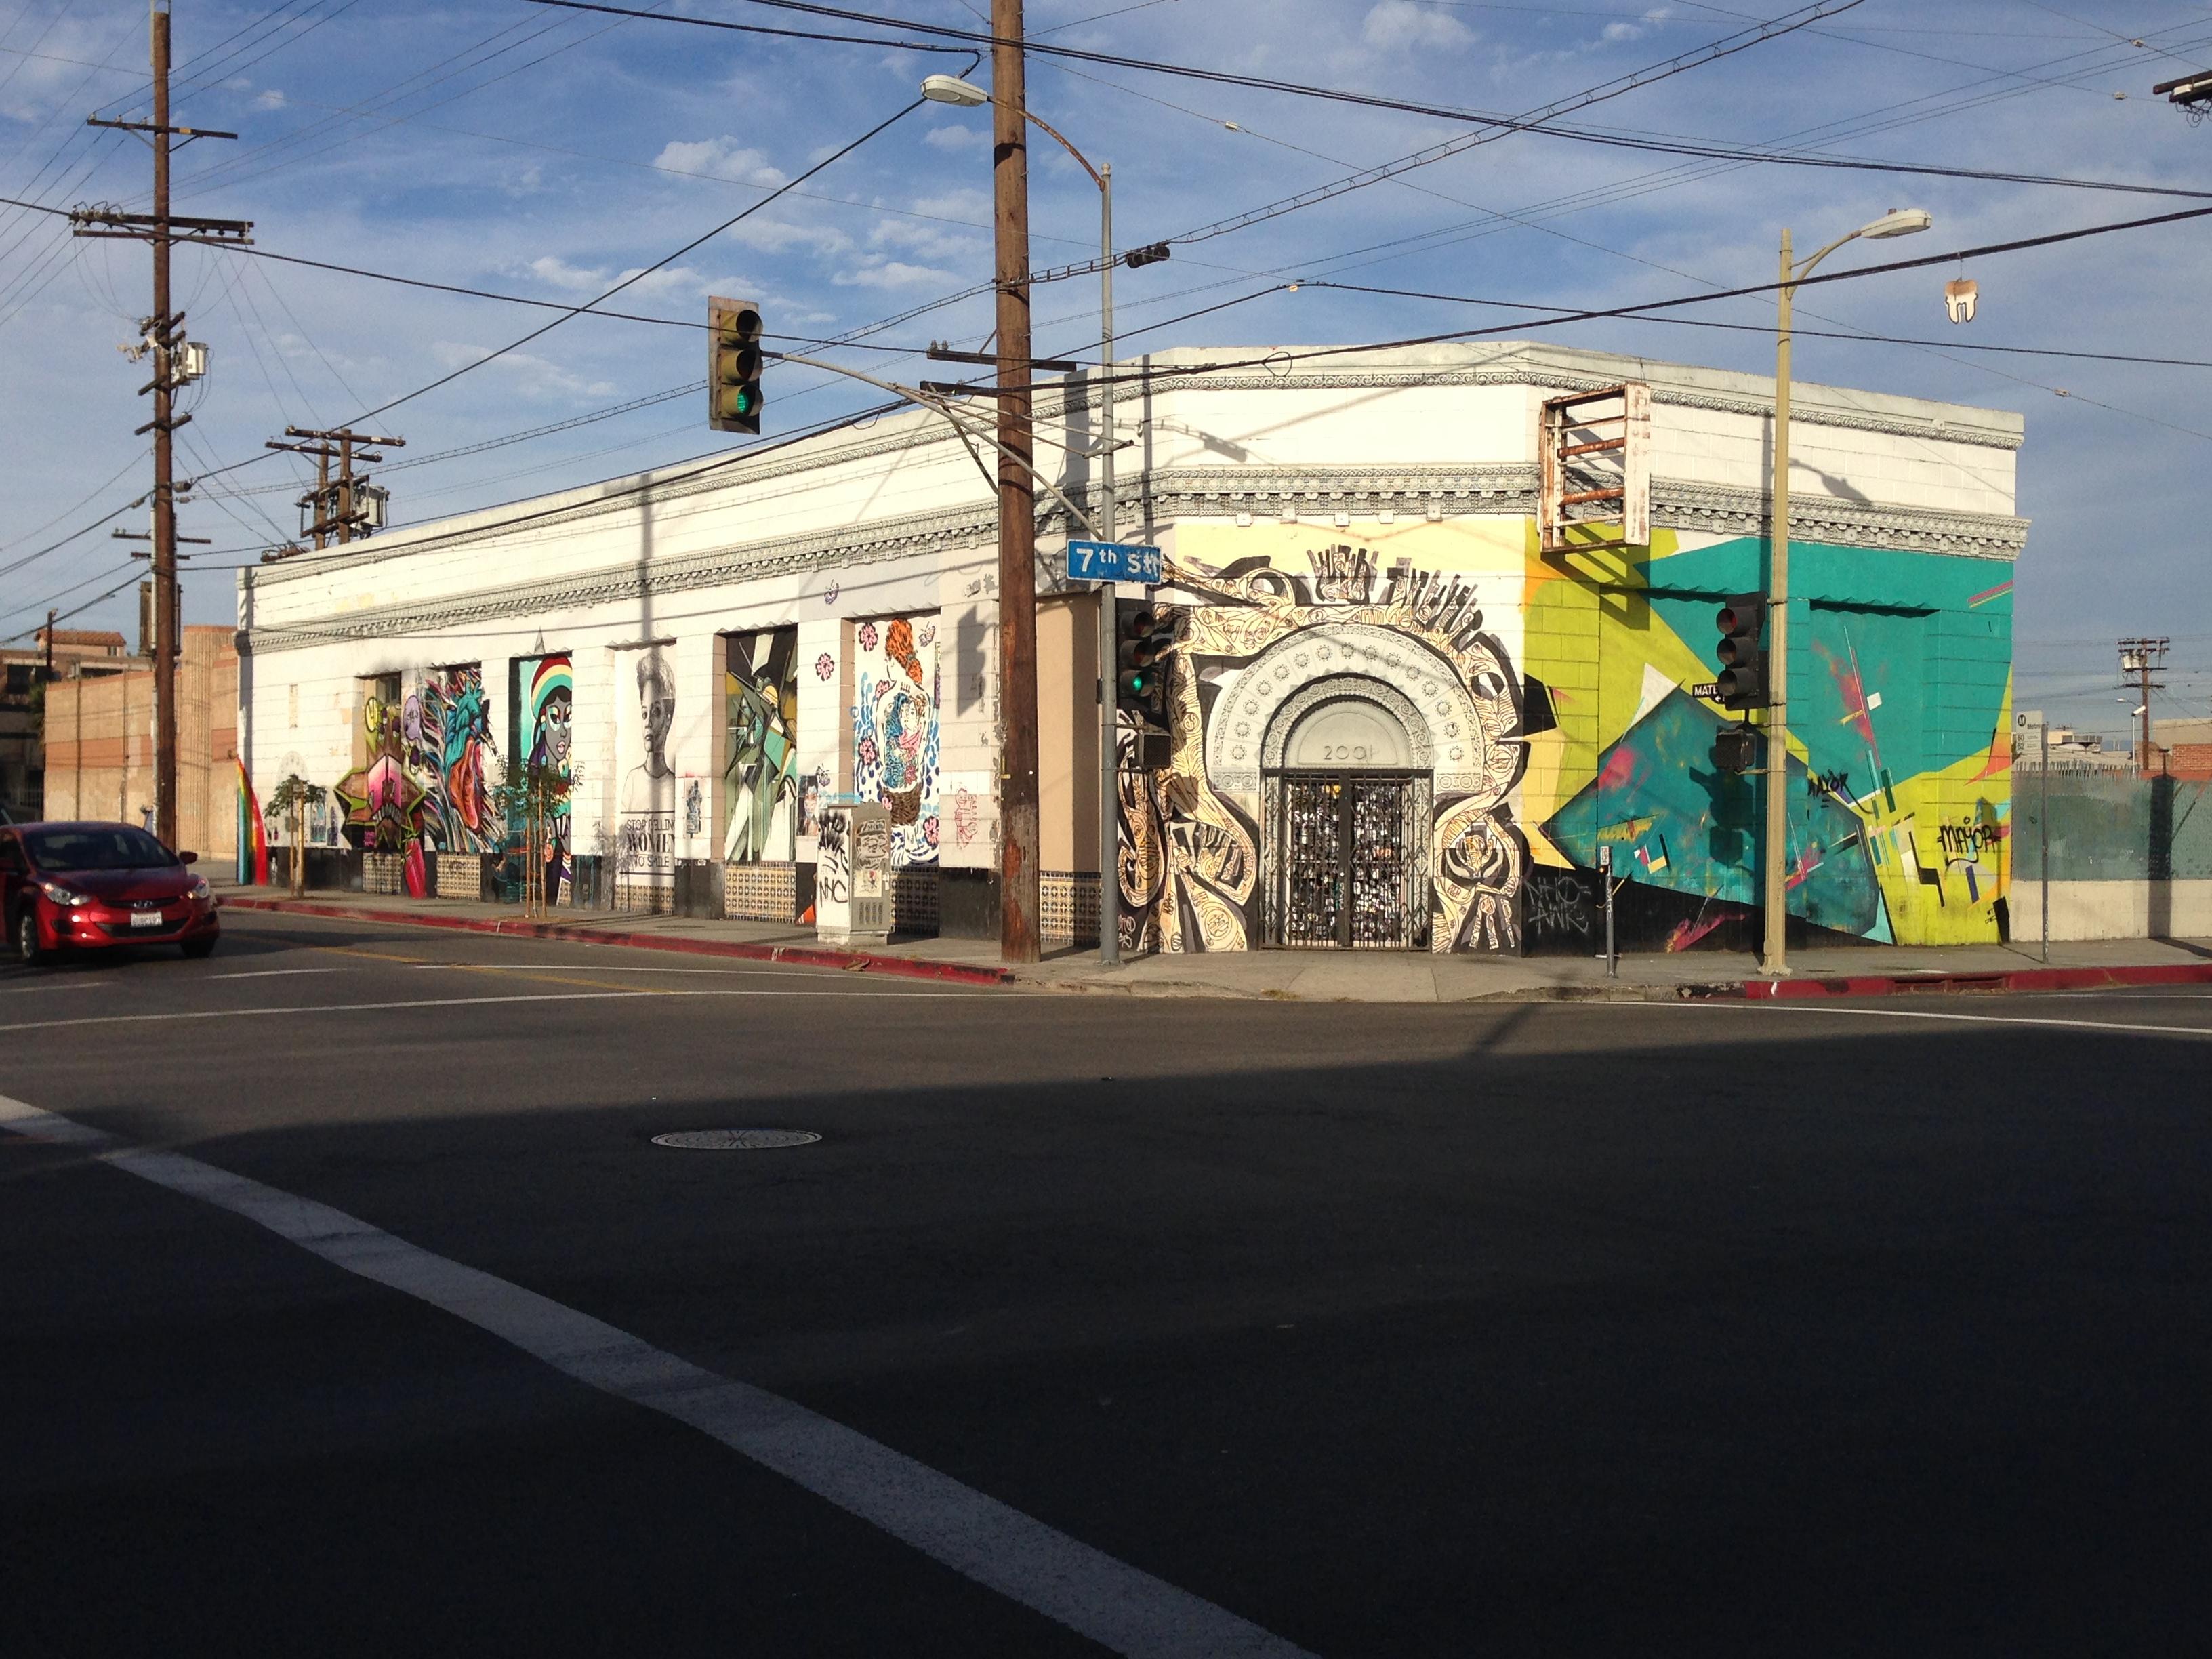 LA street art Mateo and seventh street